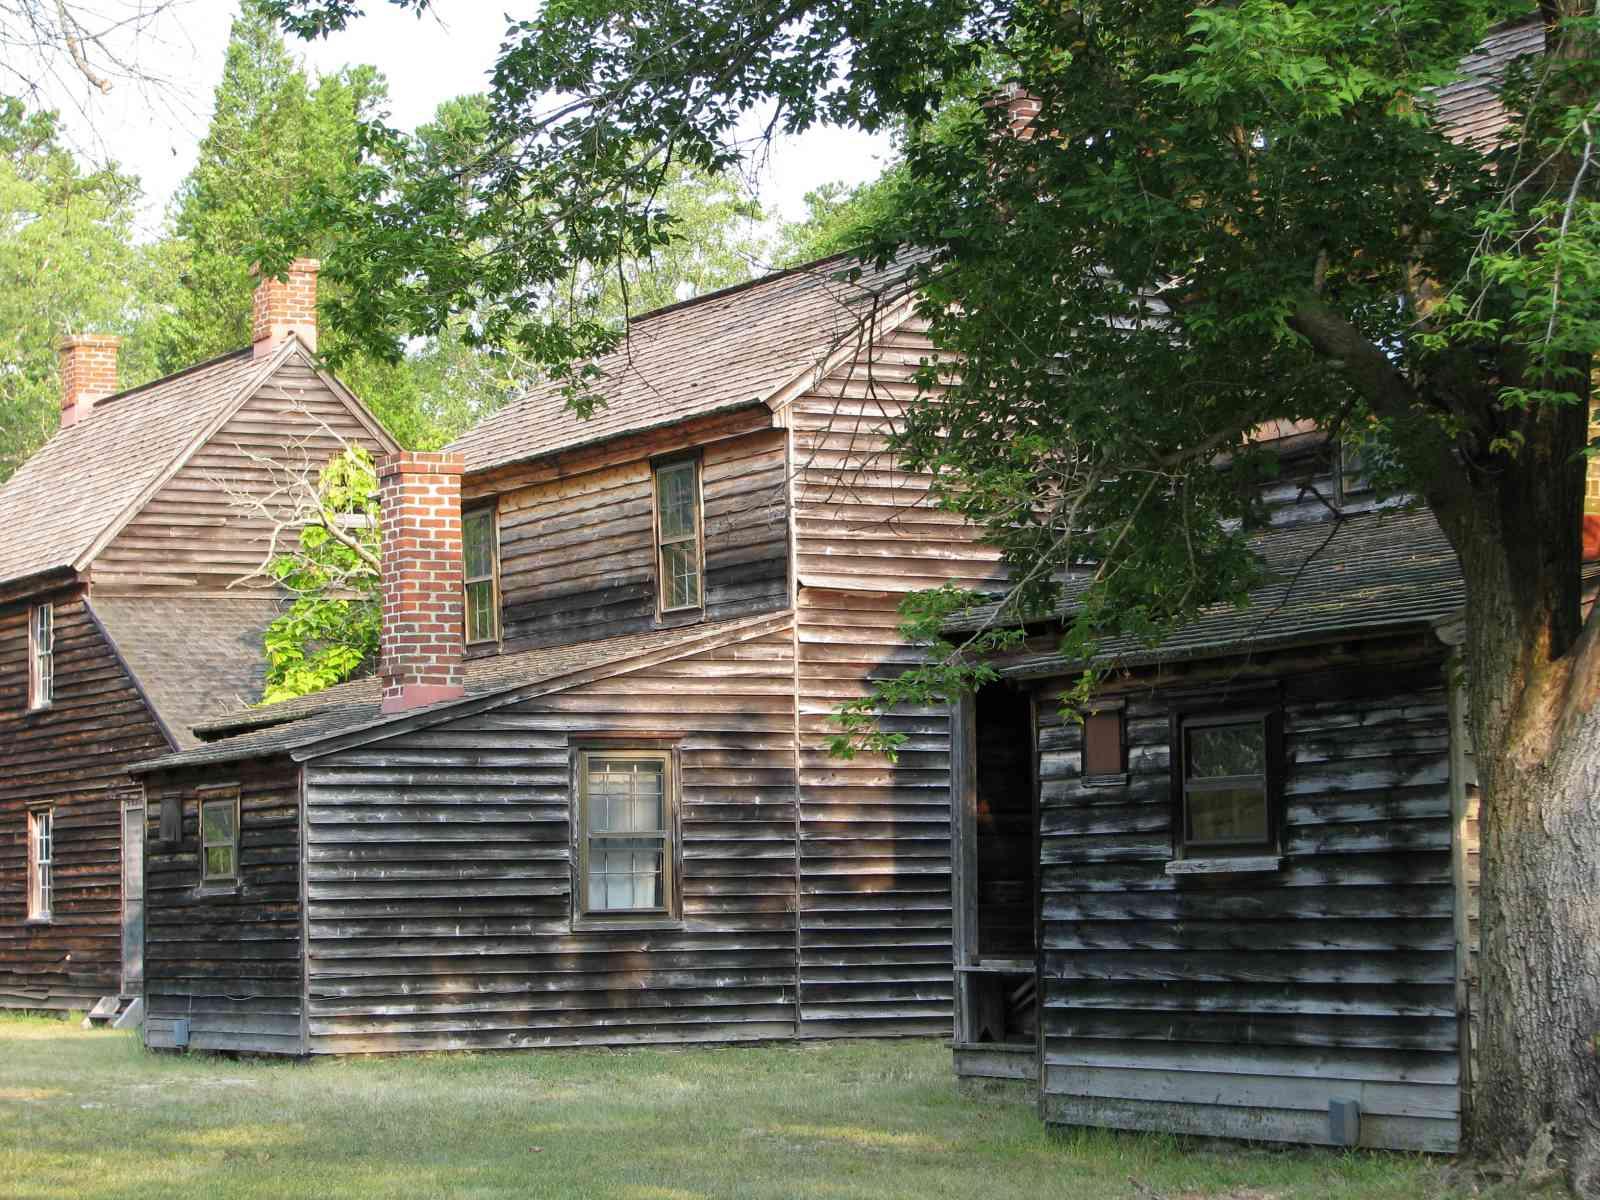 Historical wooden houses in Batsto Village